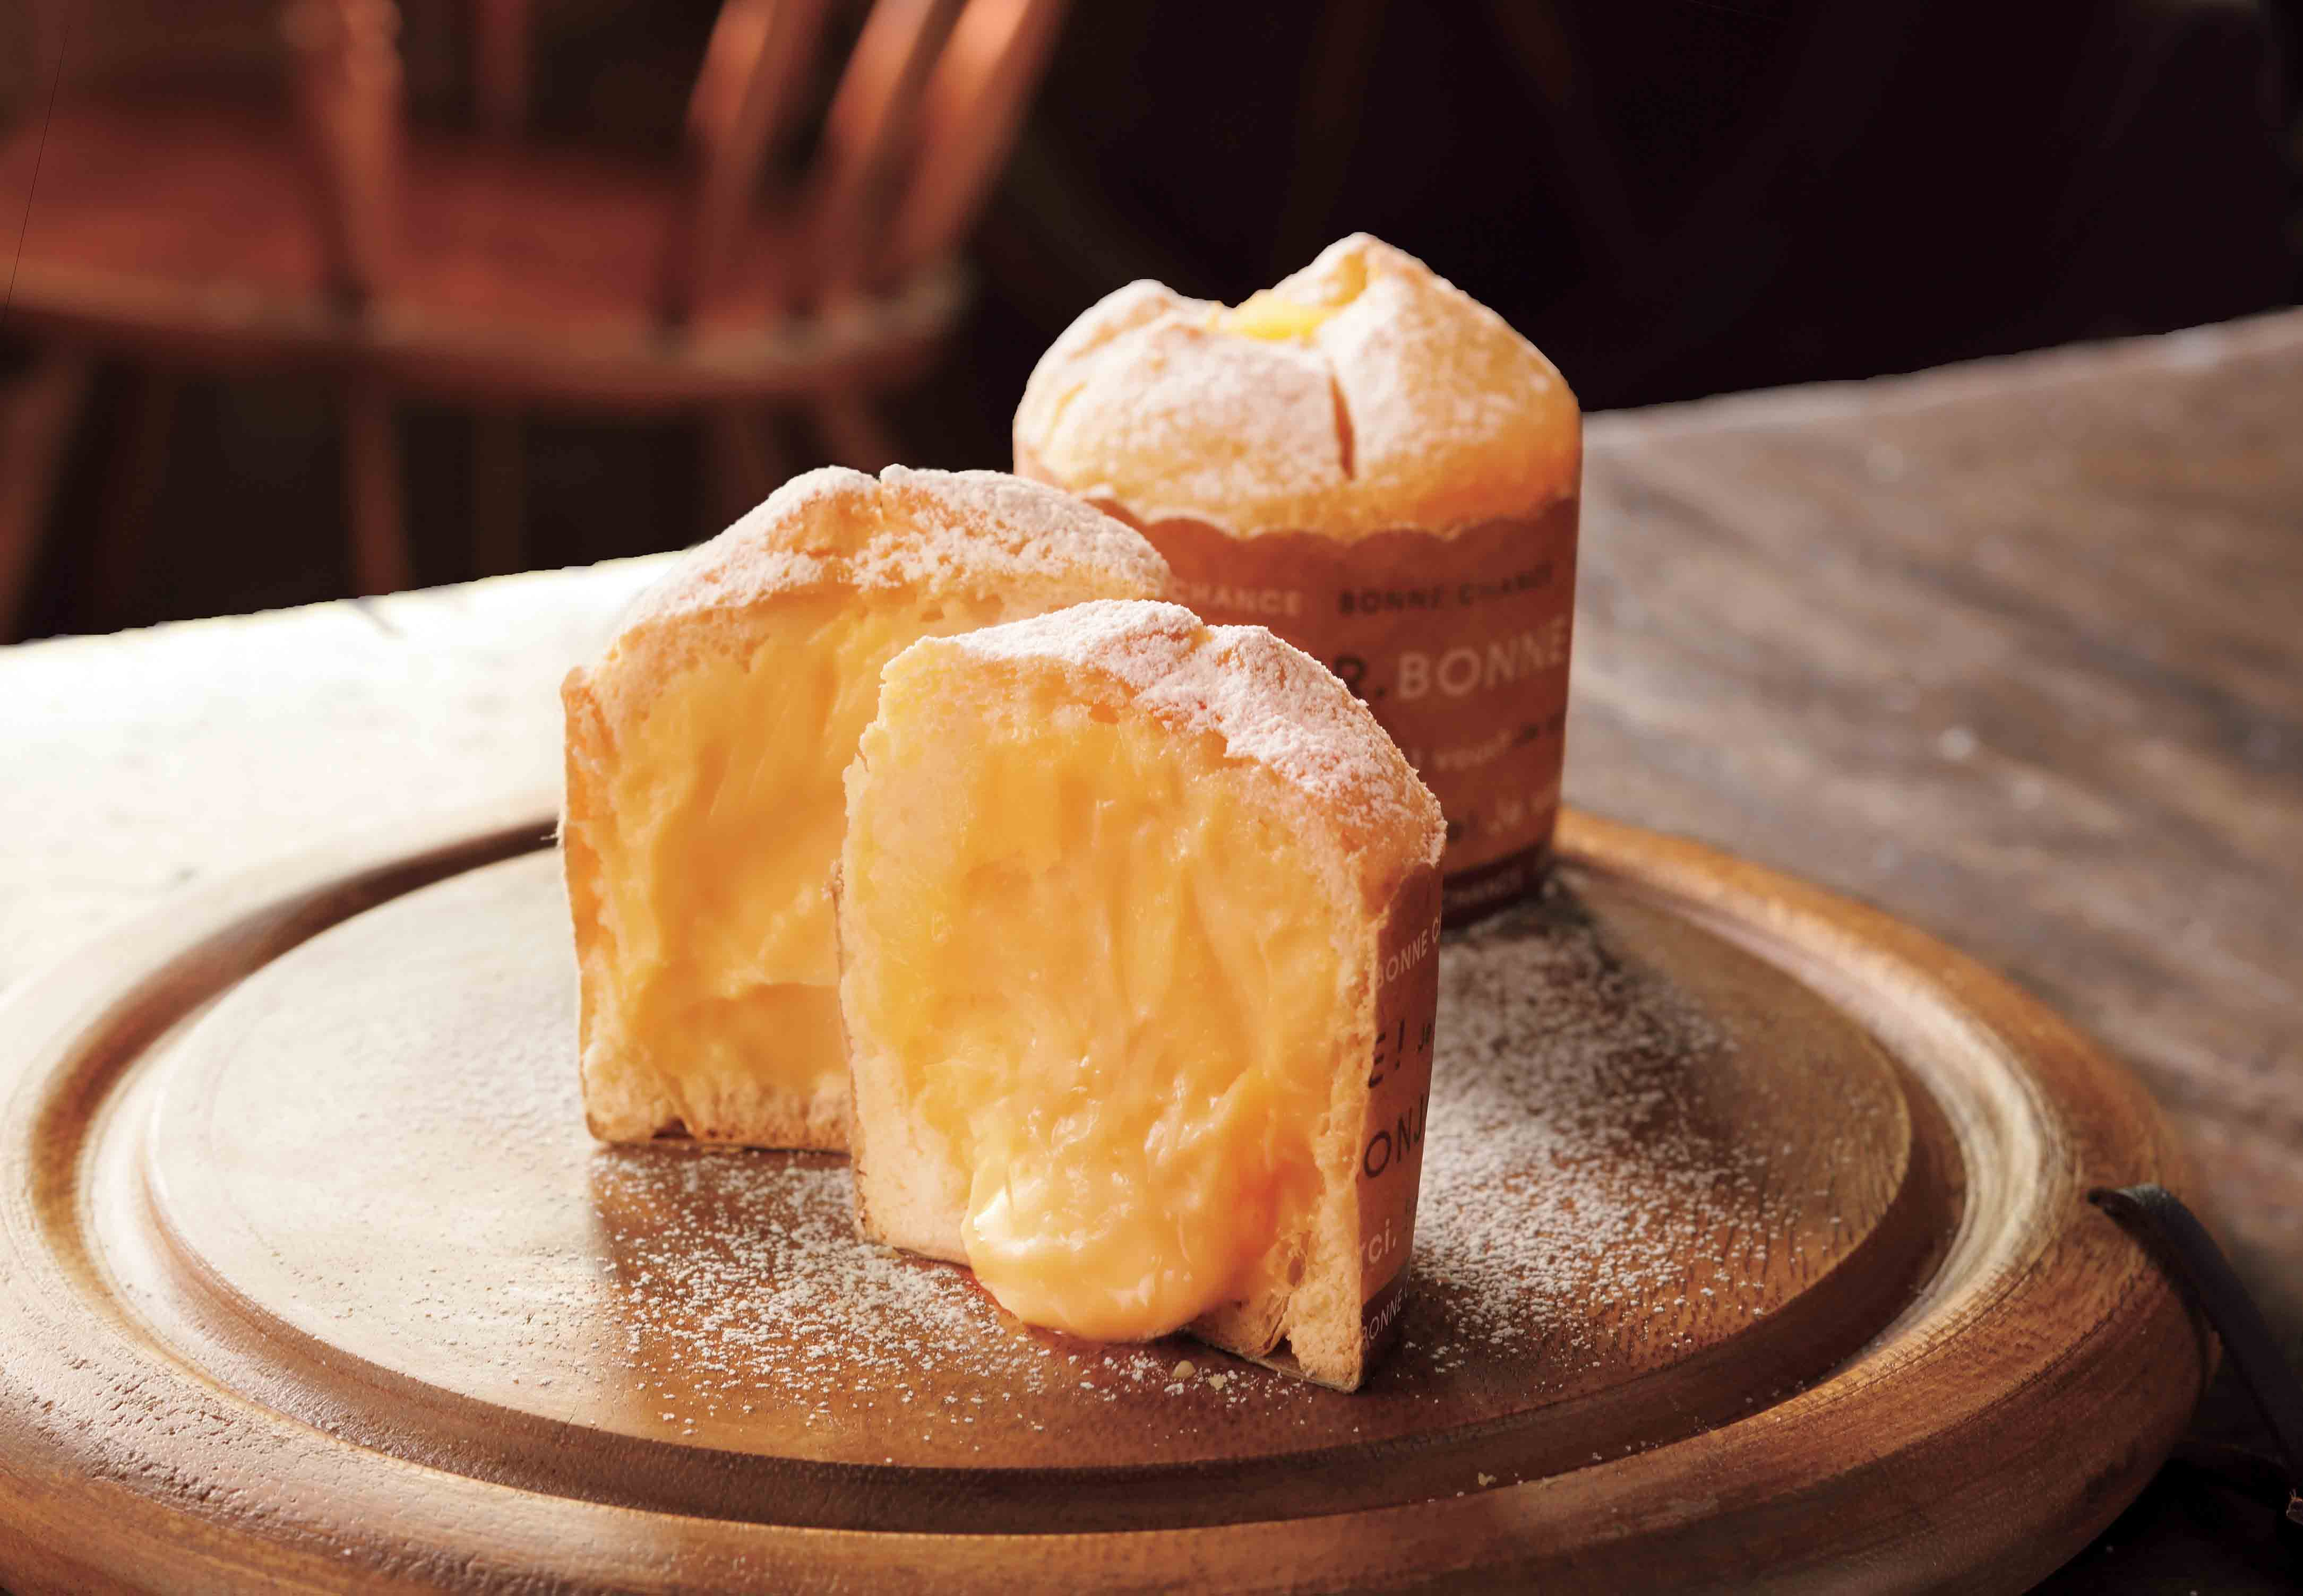 【CACHETTE】焼きカスタードメロンパン (1個)301円 上部はクッキーのようなサクッと、側面はふんわり。中にはなめらかなカスタードクリームが入ったマフィン型のメロンパン。《実演》